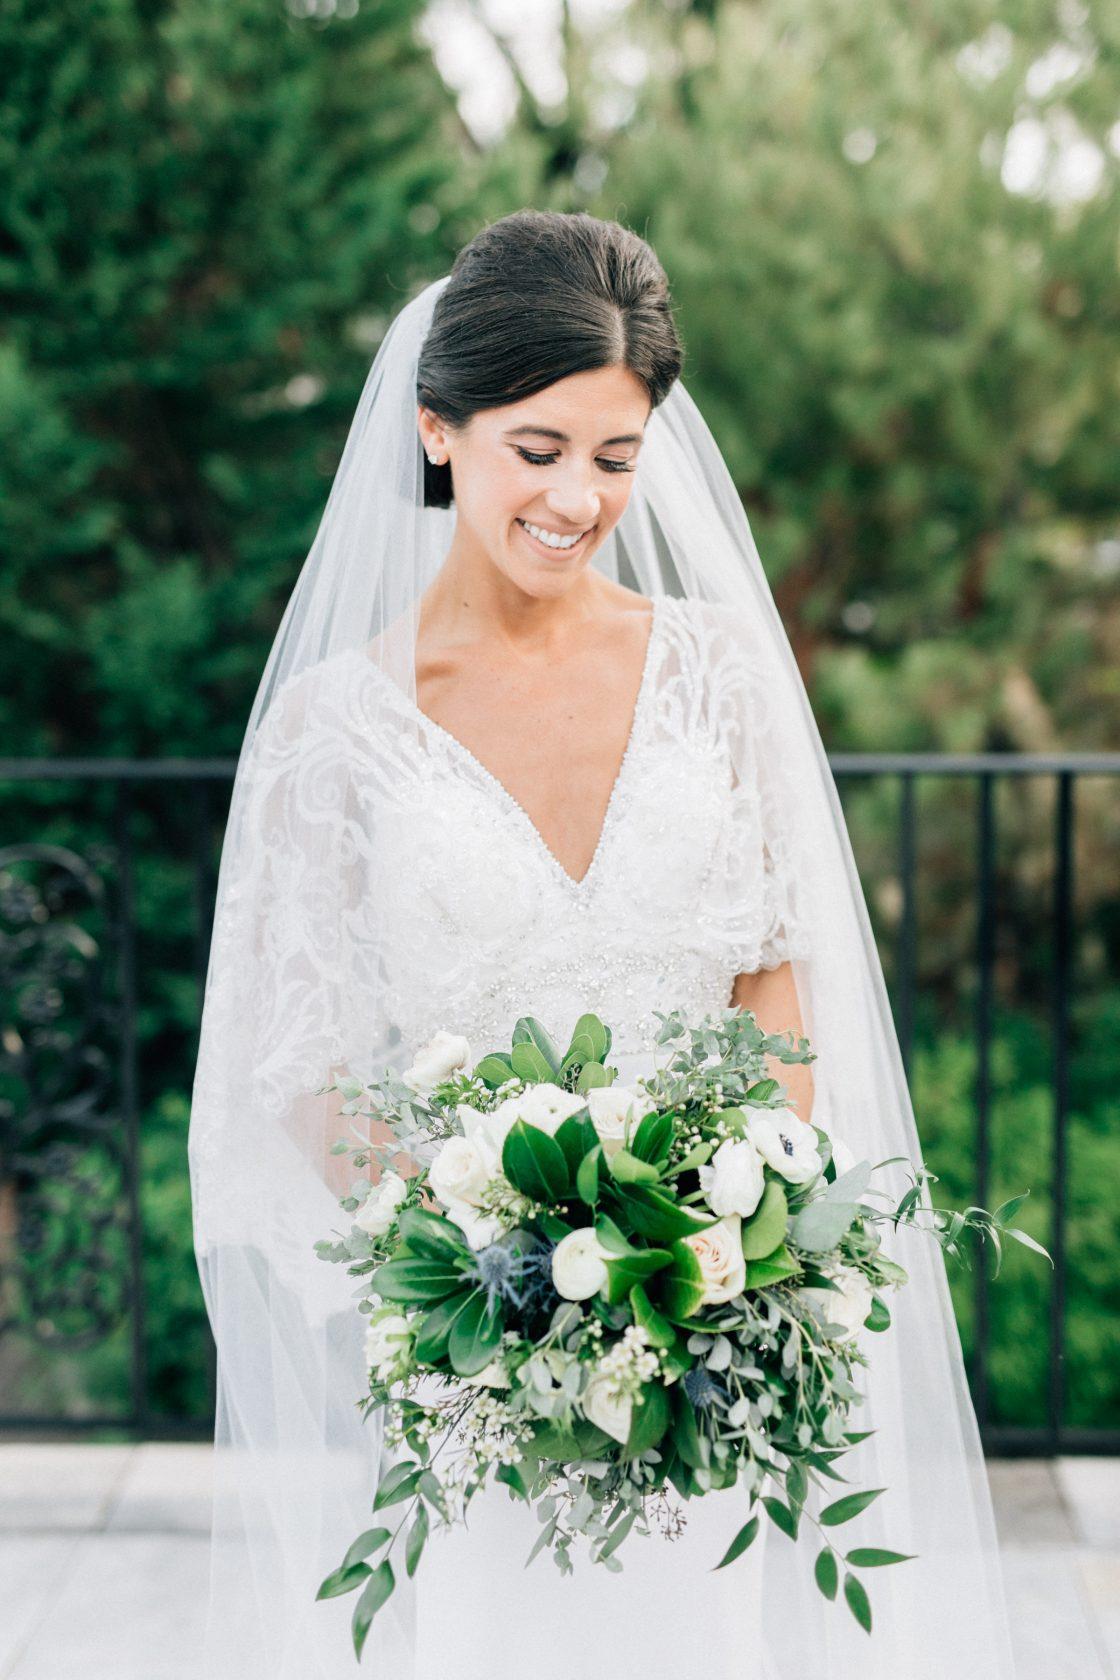 Elegant New Jersey Wedding with Greenery 64